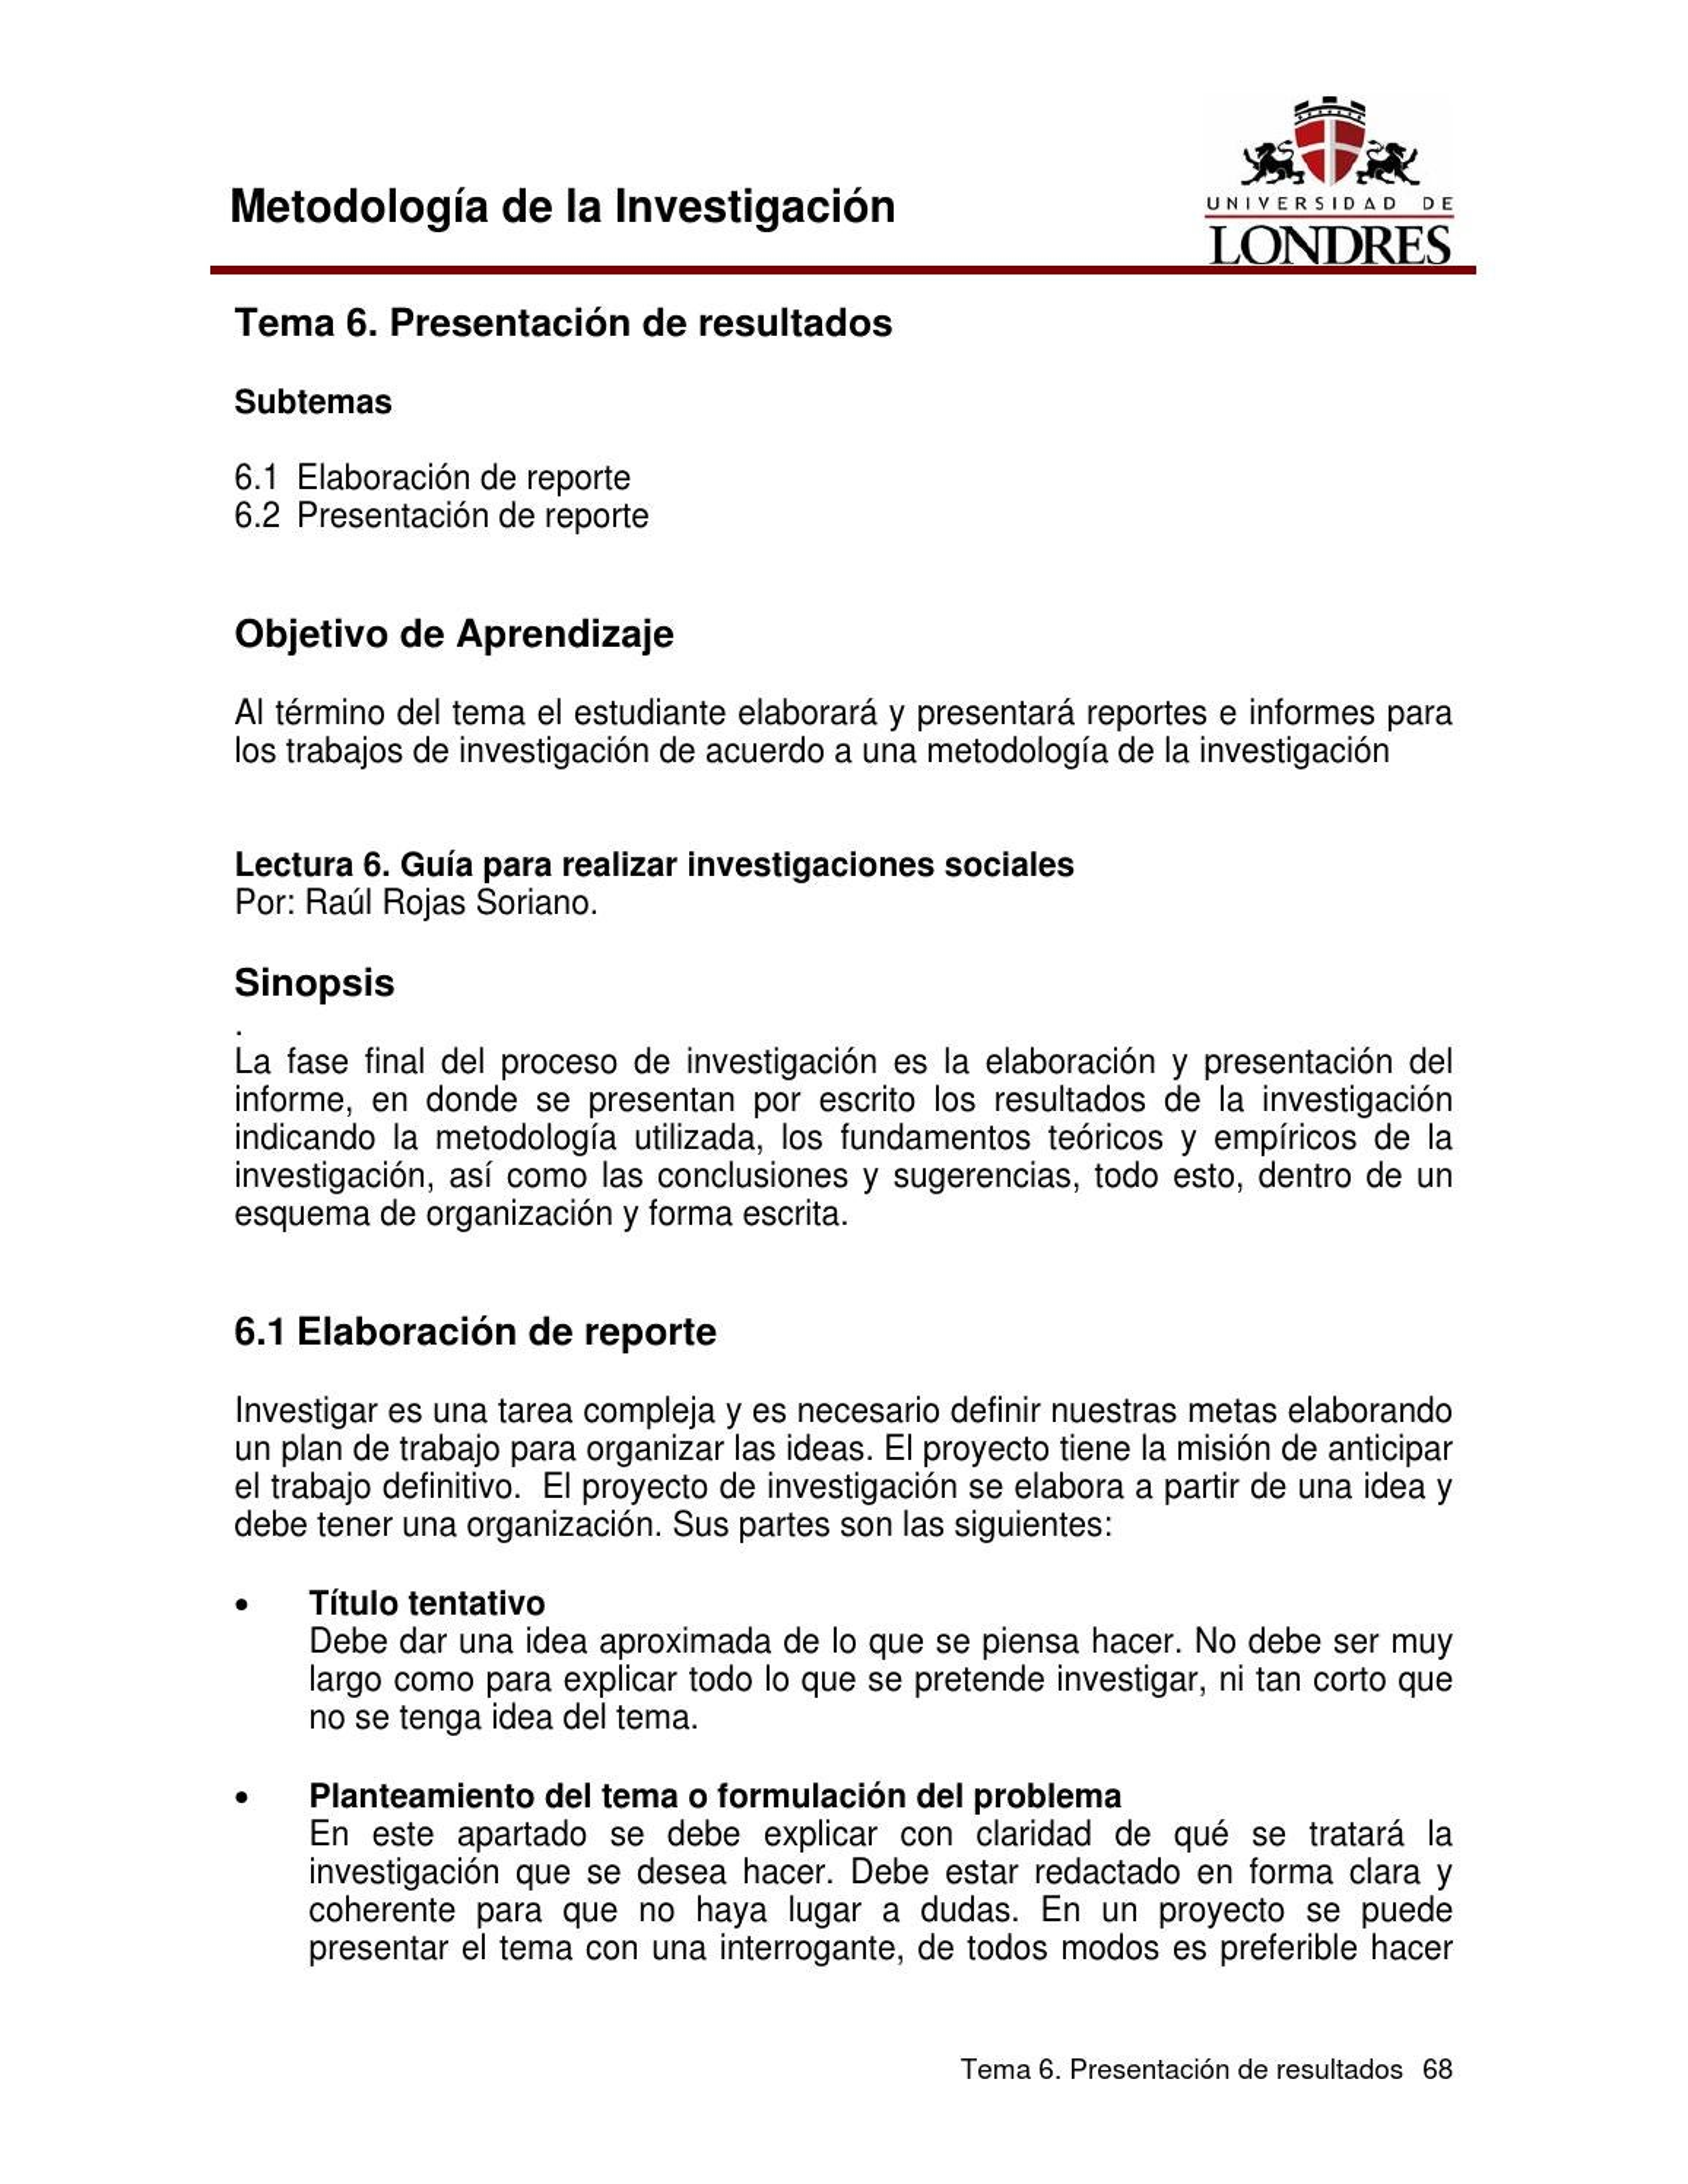 Metodologia Investigacion By John Benvin Issuu